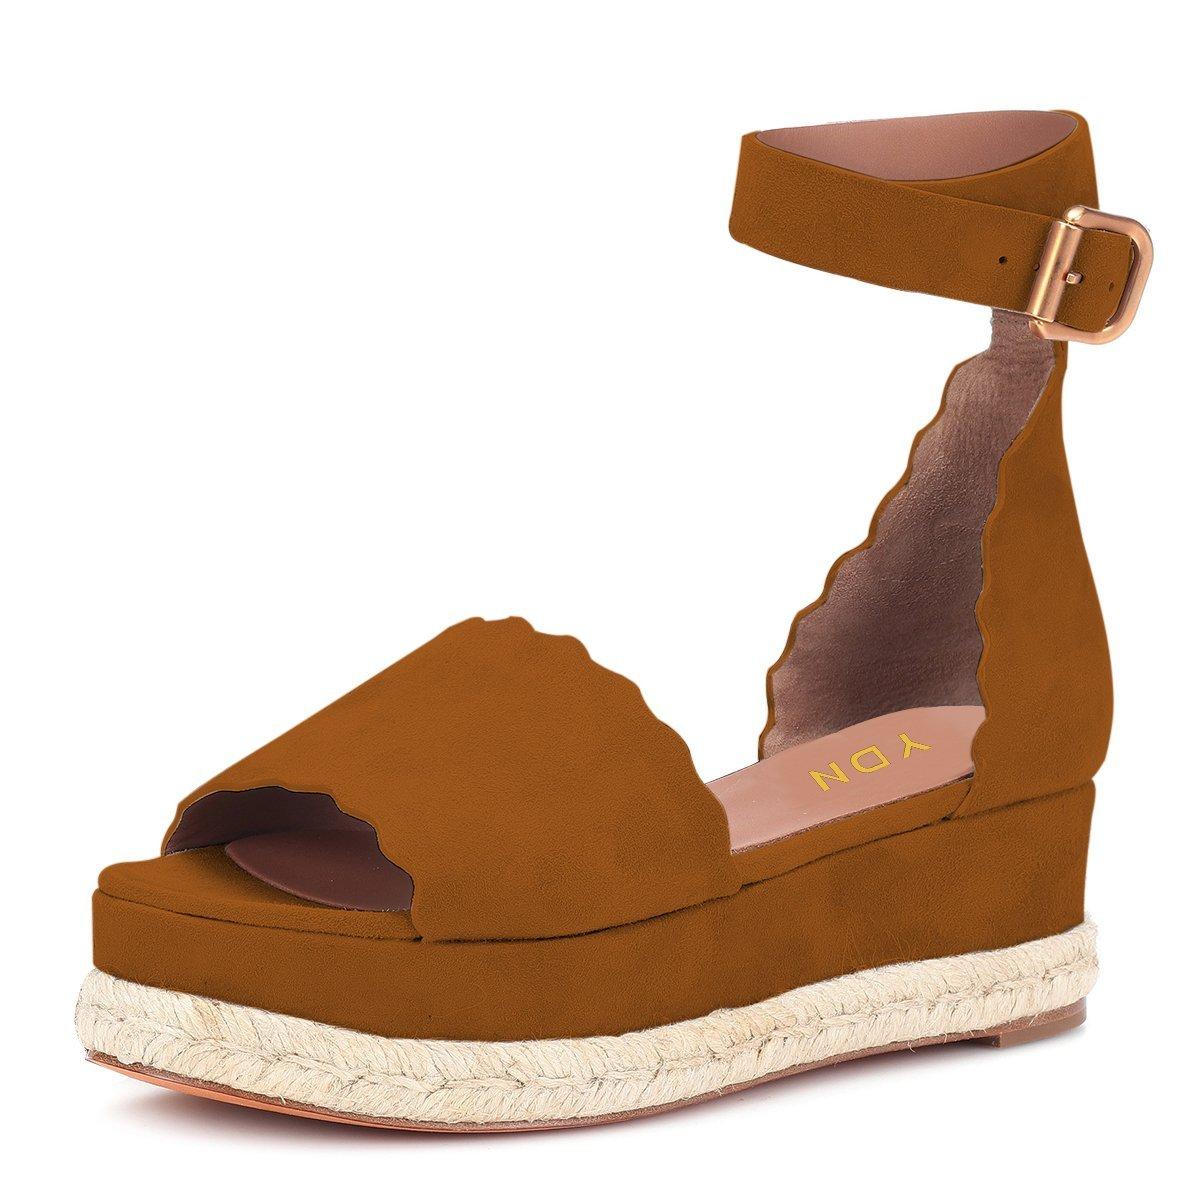 YDN Women Espadrille Peep Toe Ankle Straps Wedge Sandals Low Heels Platform Shoes with Buckle B07G2JHNB3 12 M US|Brown